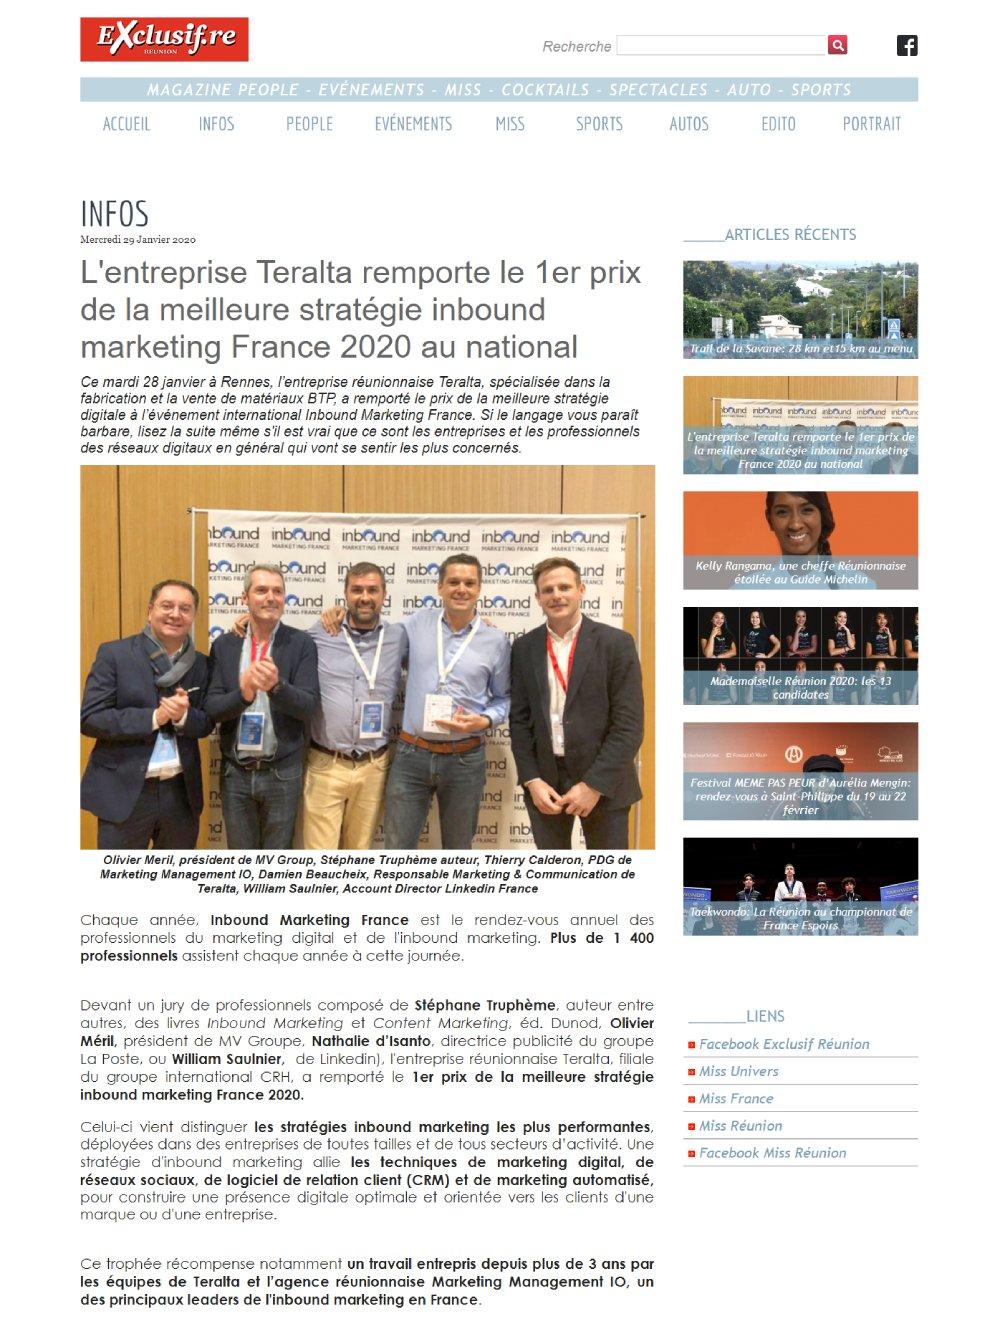 exclusif.re-teralta-premier-prix-strategie-inbound-marketing-france-2020